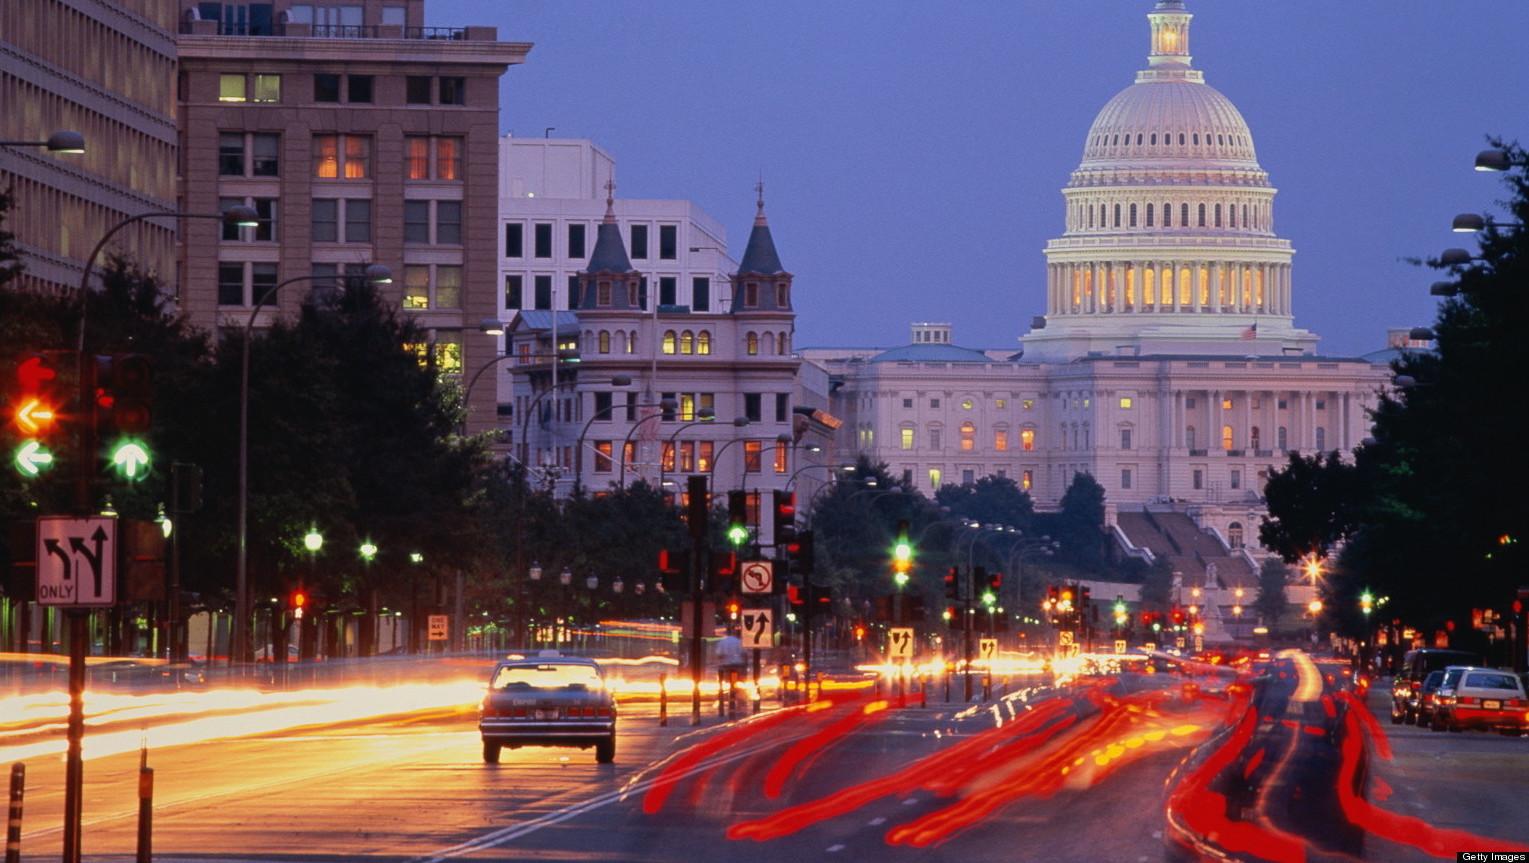 Washington-DC-City-At-Night-Pictures.jpg